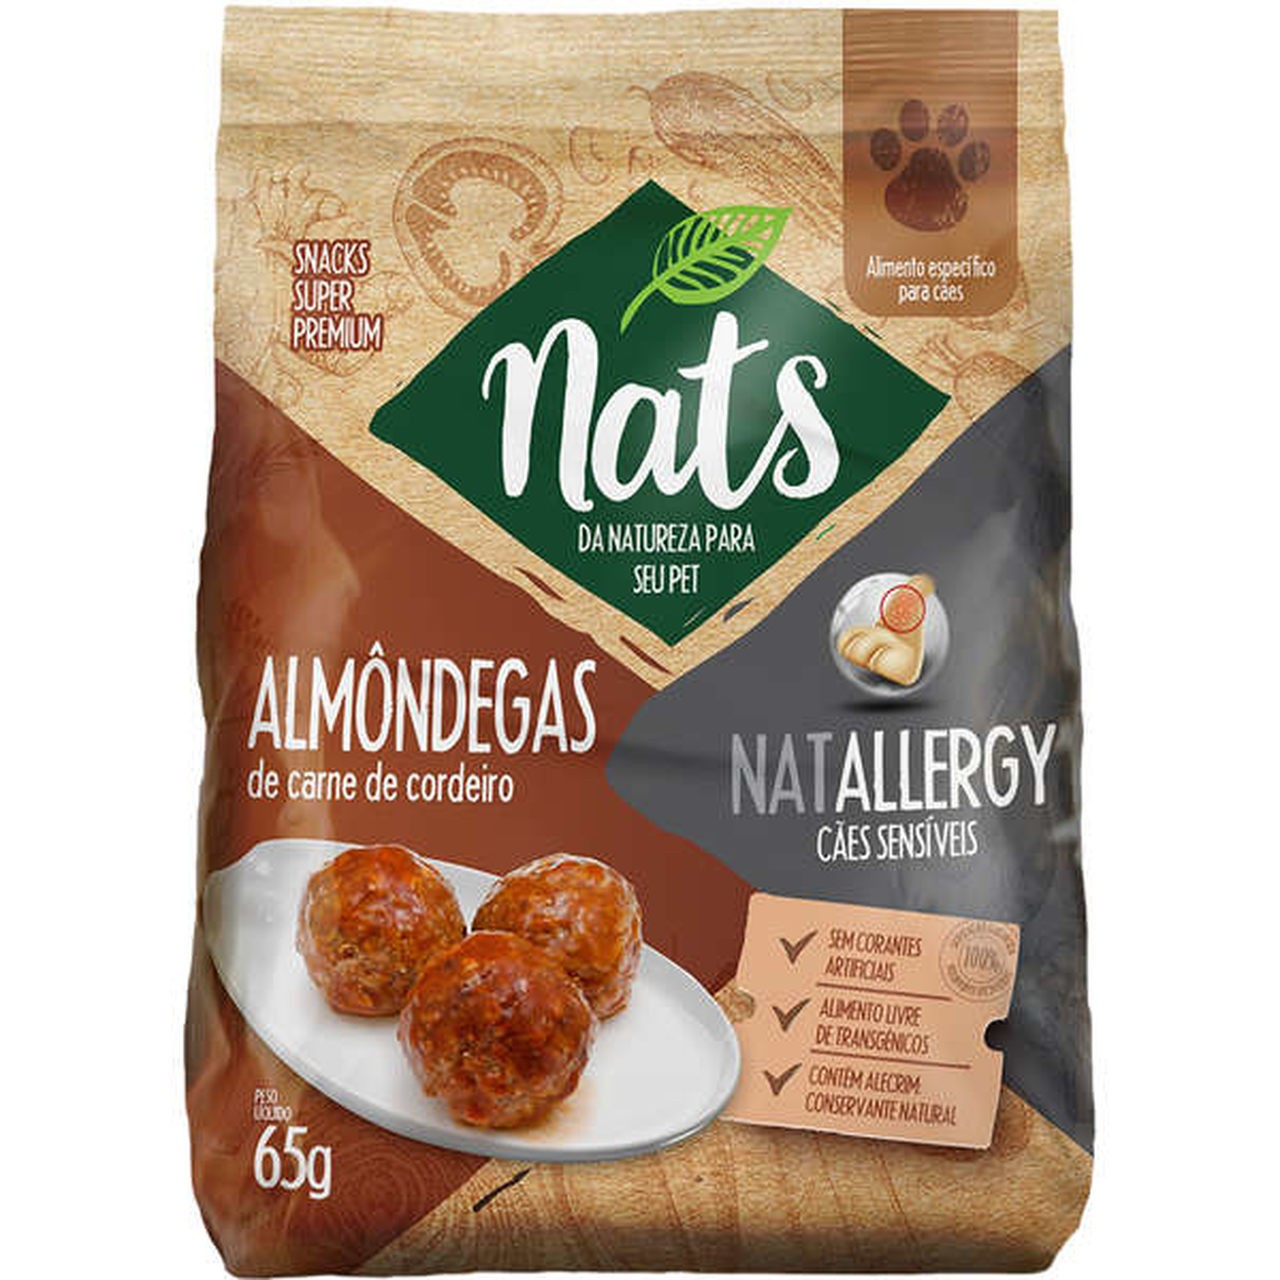 Snacks Super Premium Nats  NatAllergy Almôndegas para Cães Sensíveis 65g